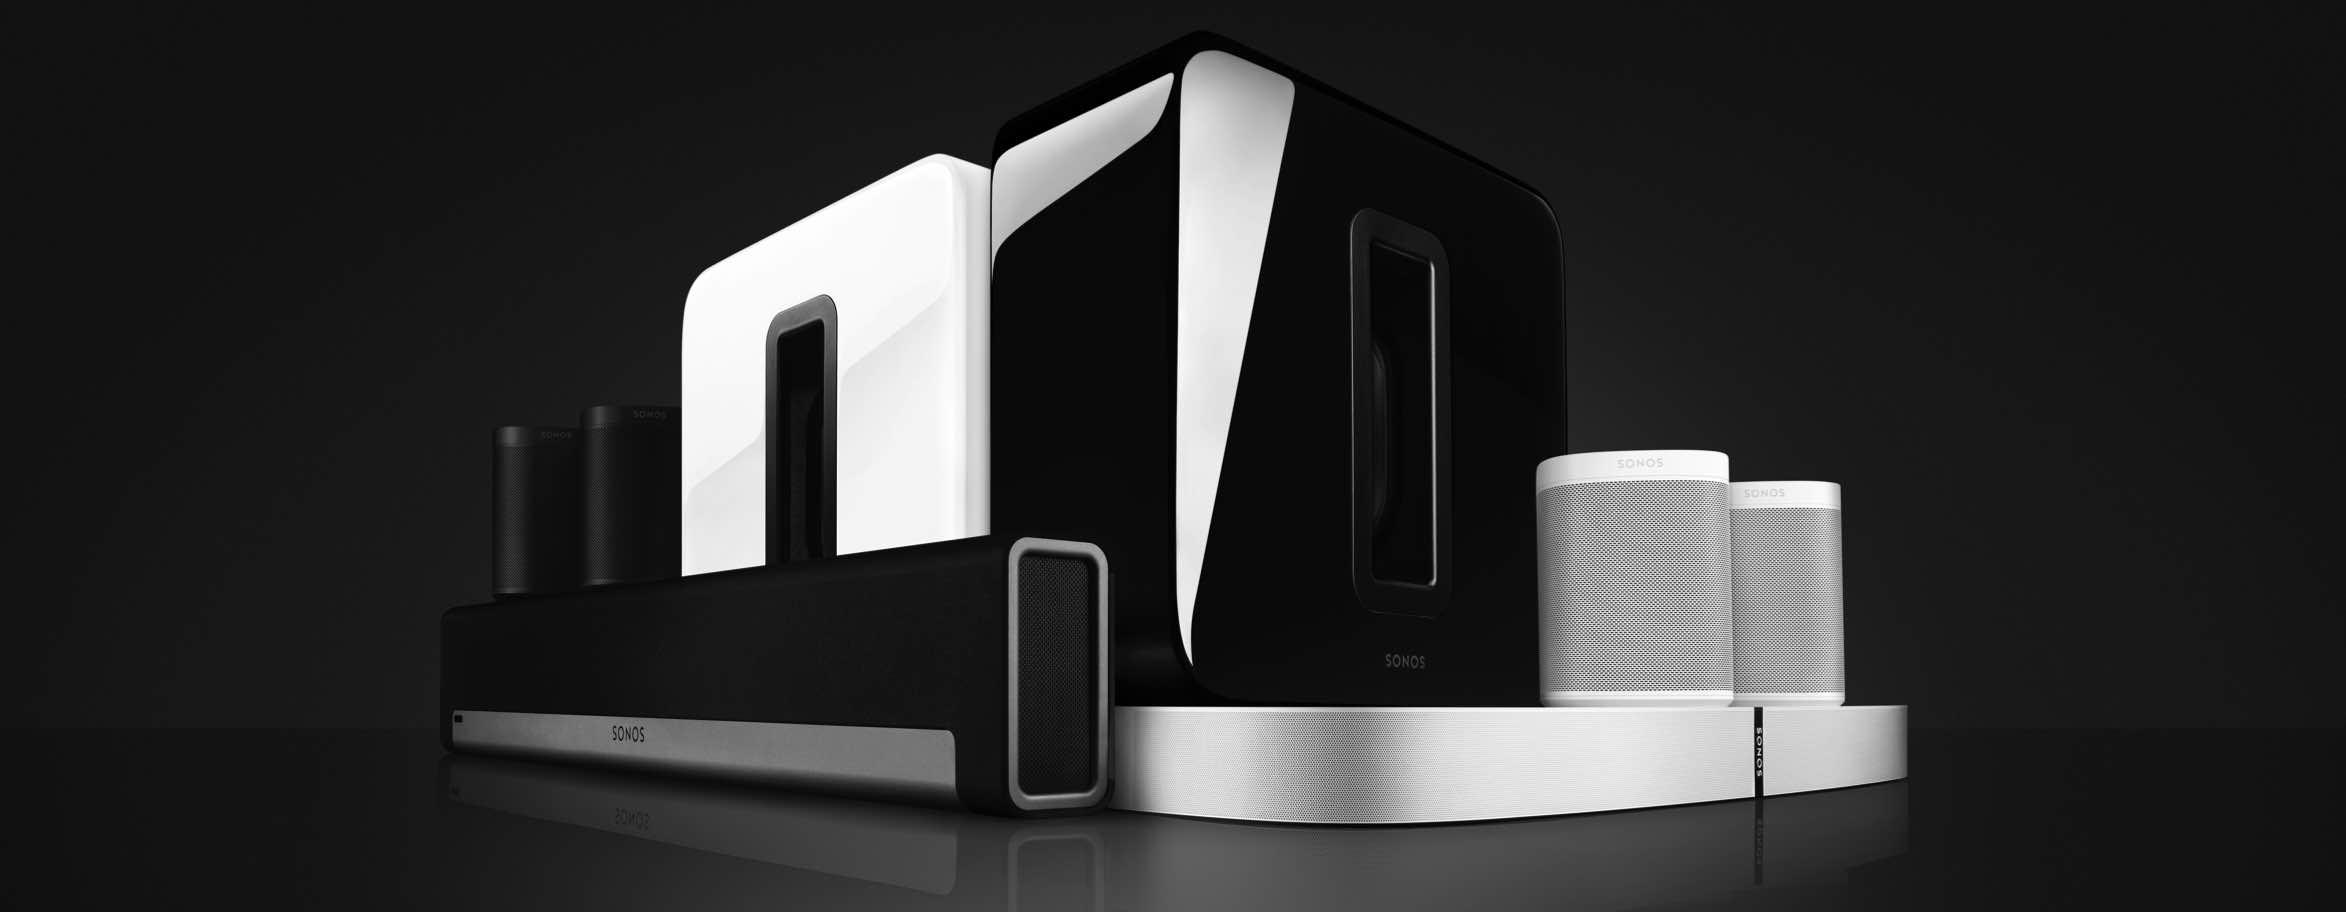 Sonos multiroom speakers